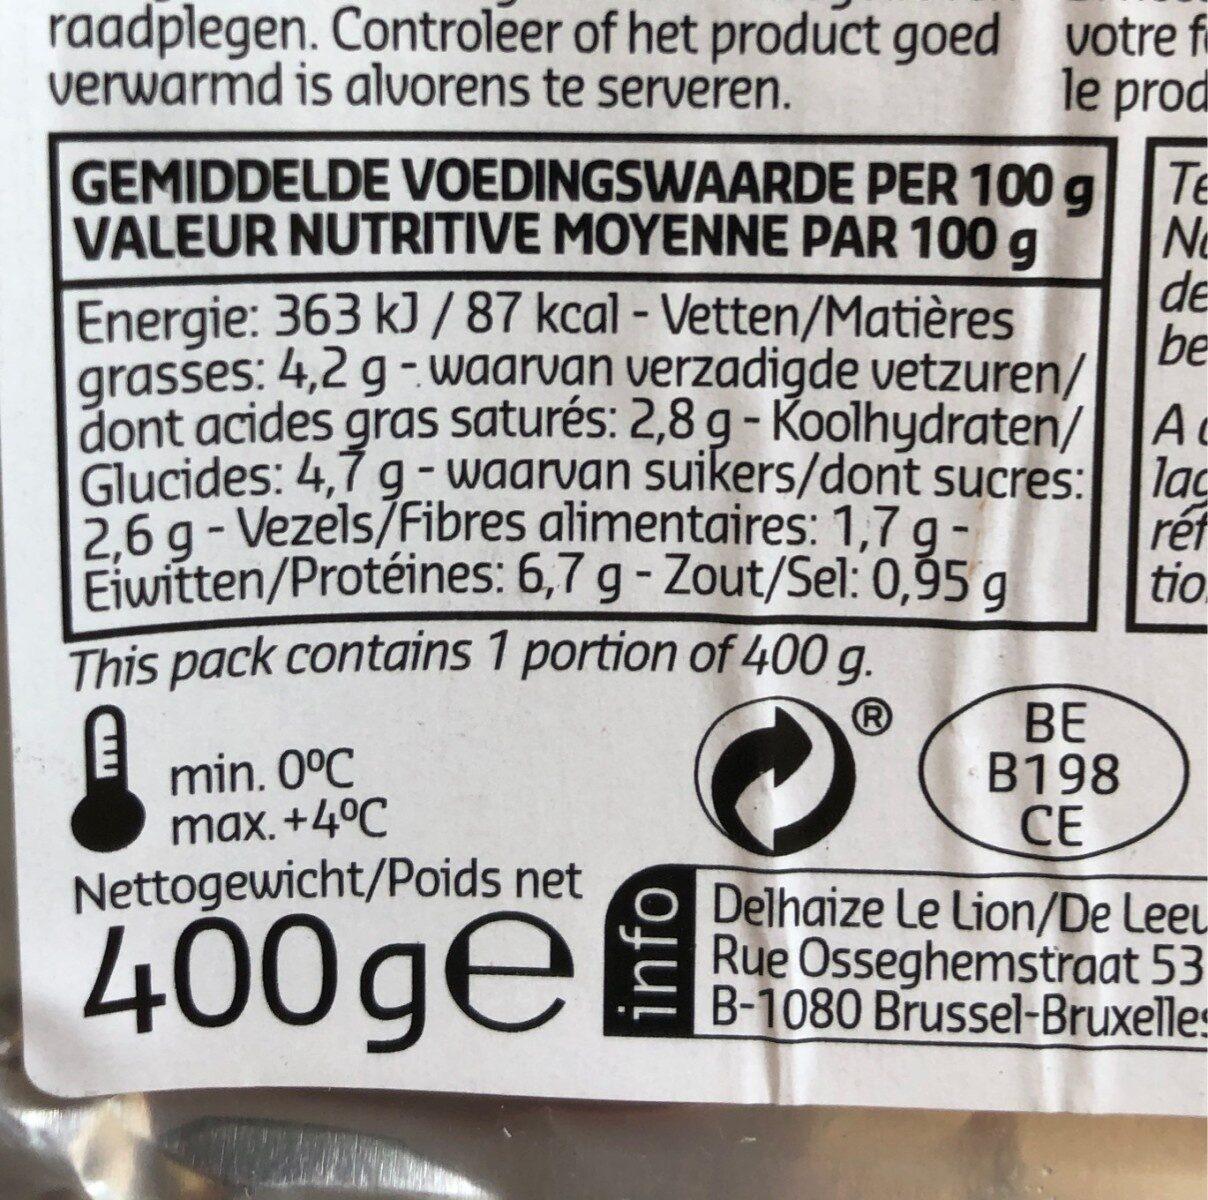 Roulades de jambon aux chicons - Voedingswaarden - fr